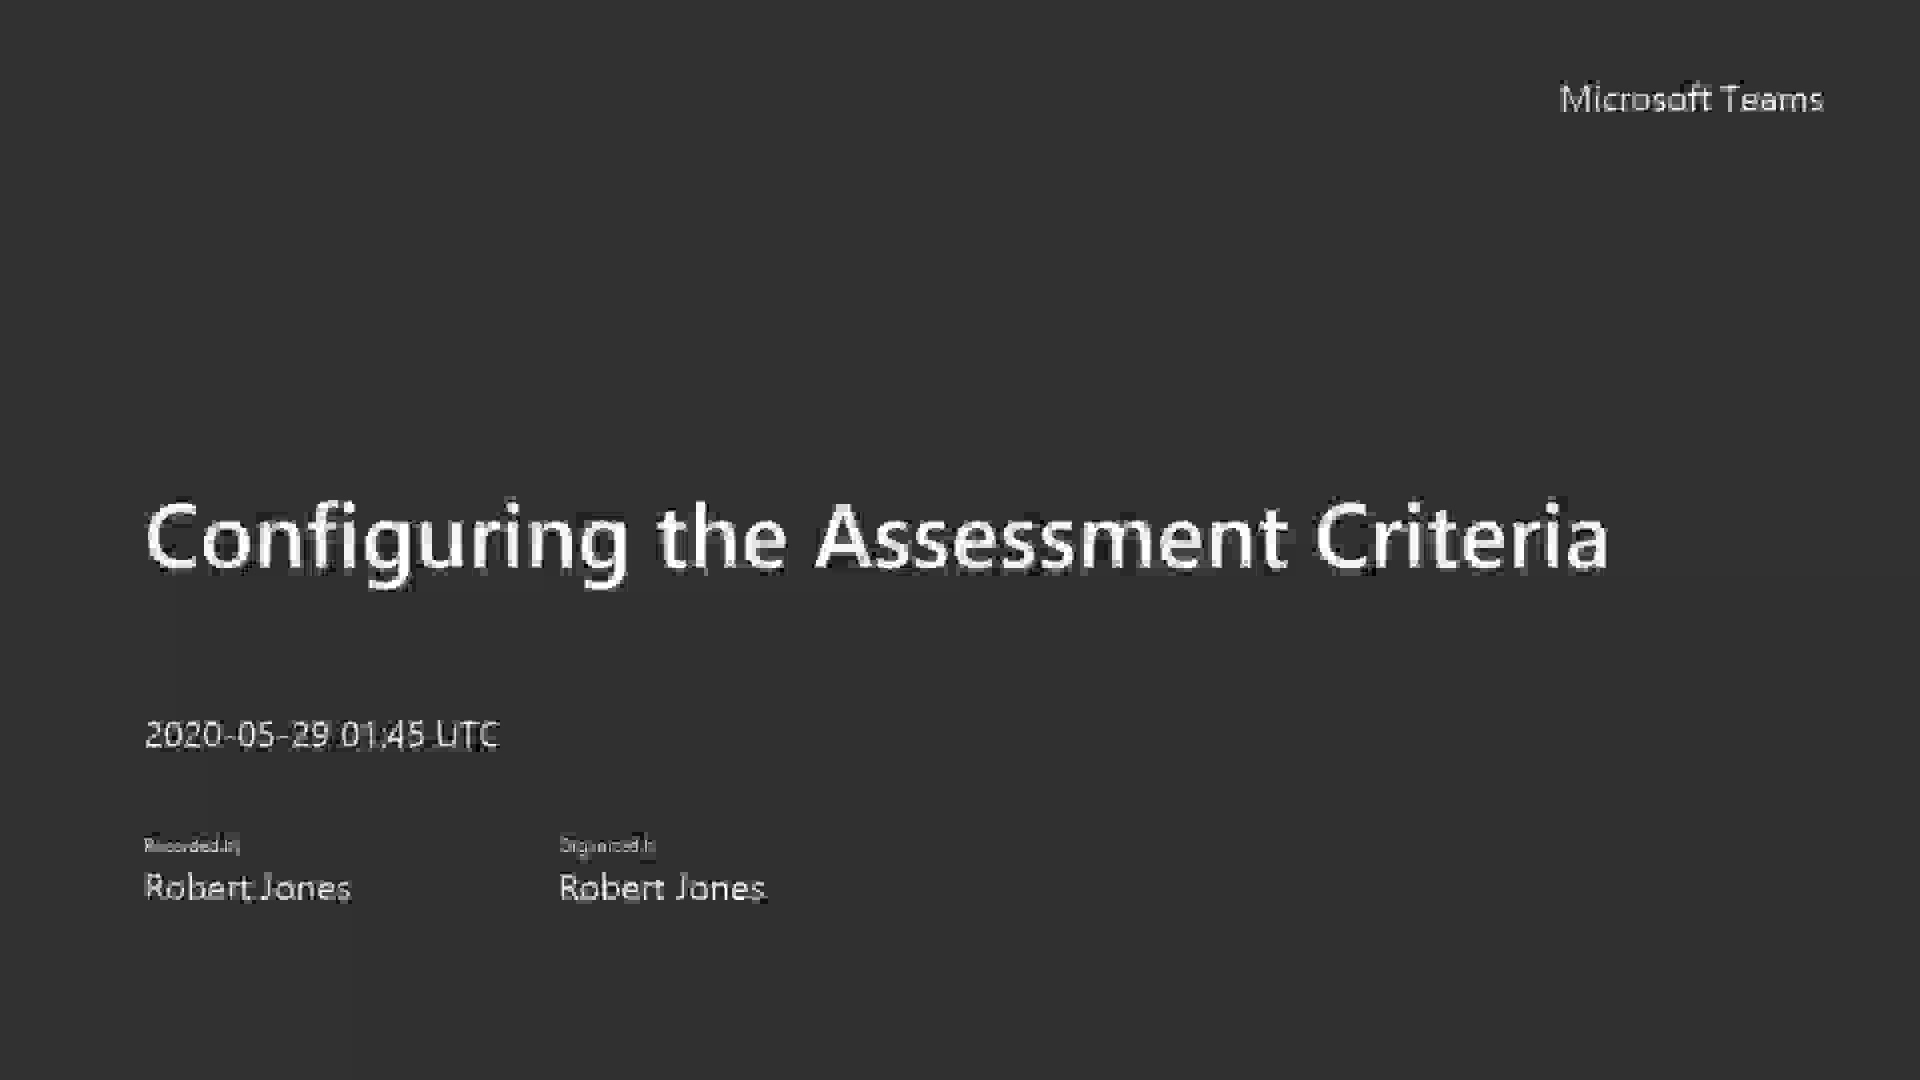 5.3 Configuring the Assessment Criteria